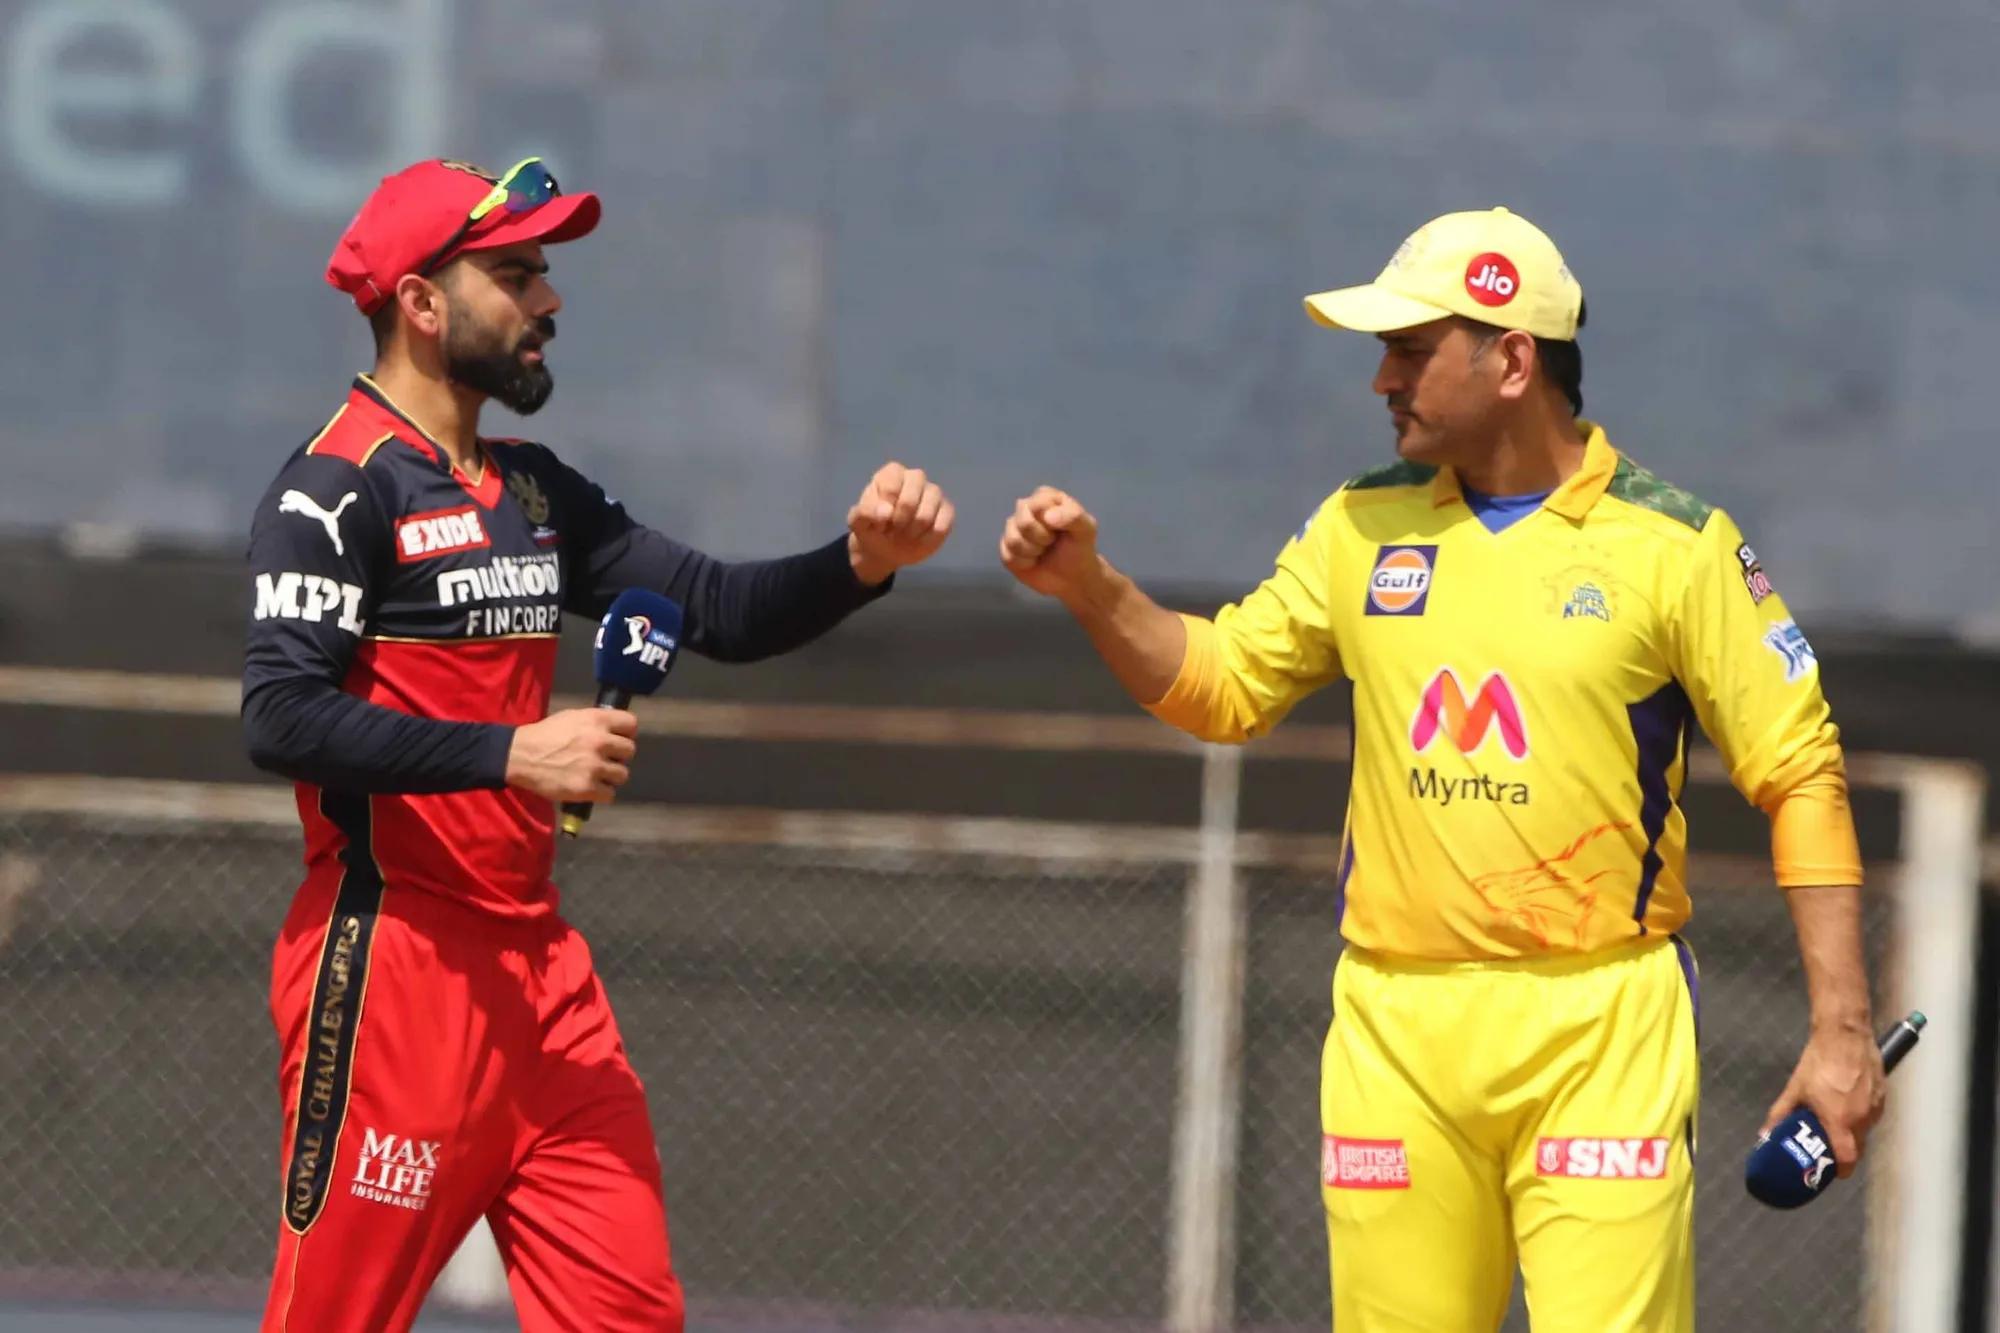 CSK had beaten RCB in the first half of the IPL 2021 in Mumbai | BCCI-IPL